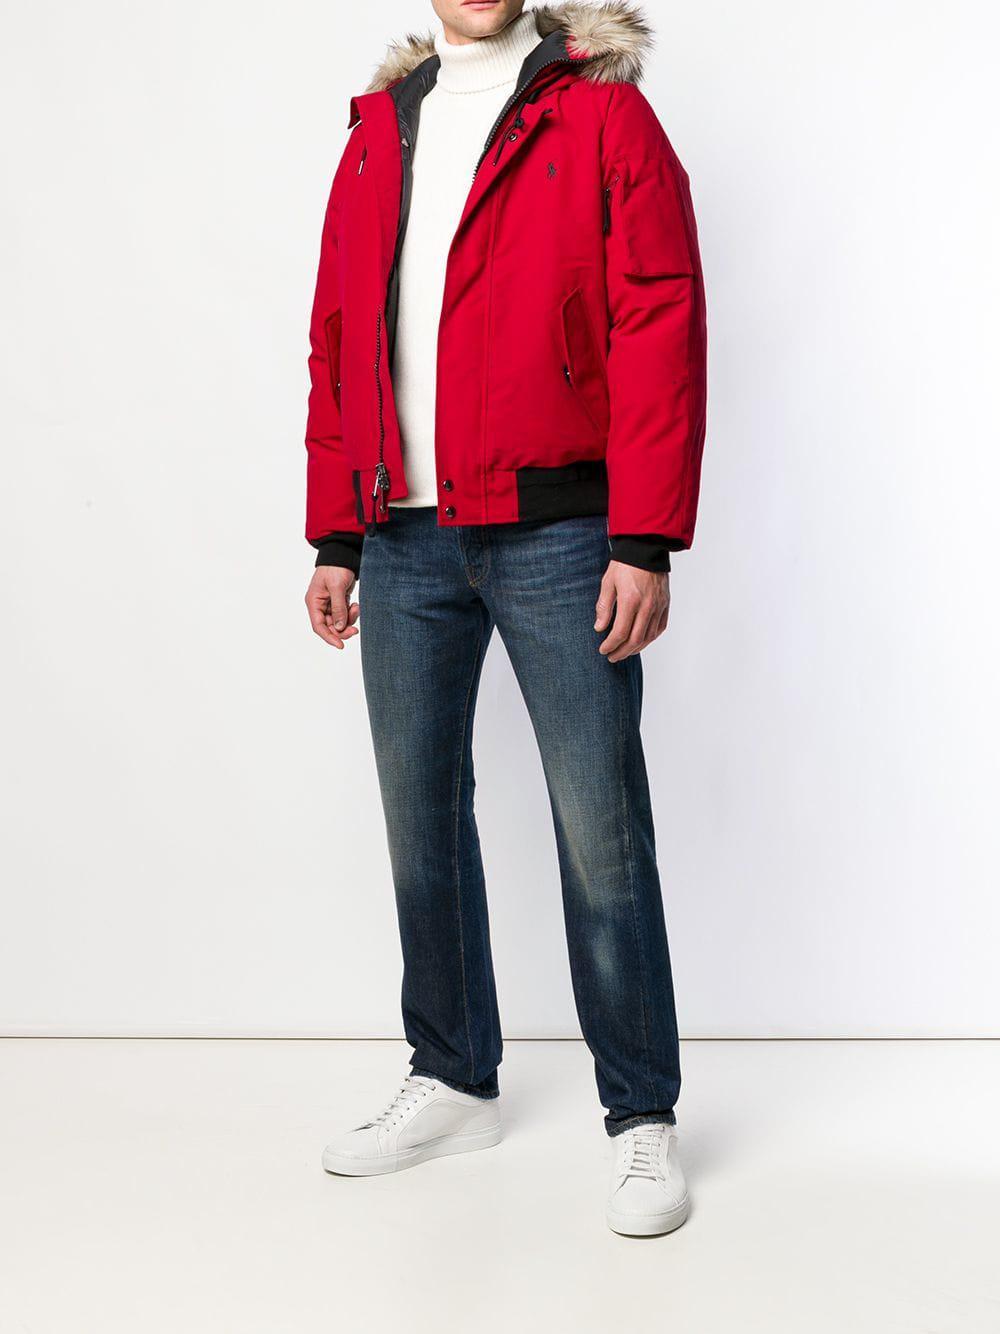 56d0e00a91d5 Lyst - Polo Ralph Lauren Faux Fur-trim Down Jacket in Red for Men - Save 72%